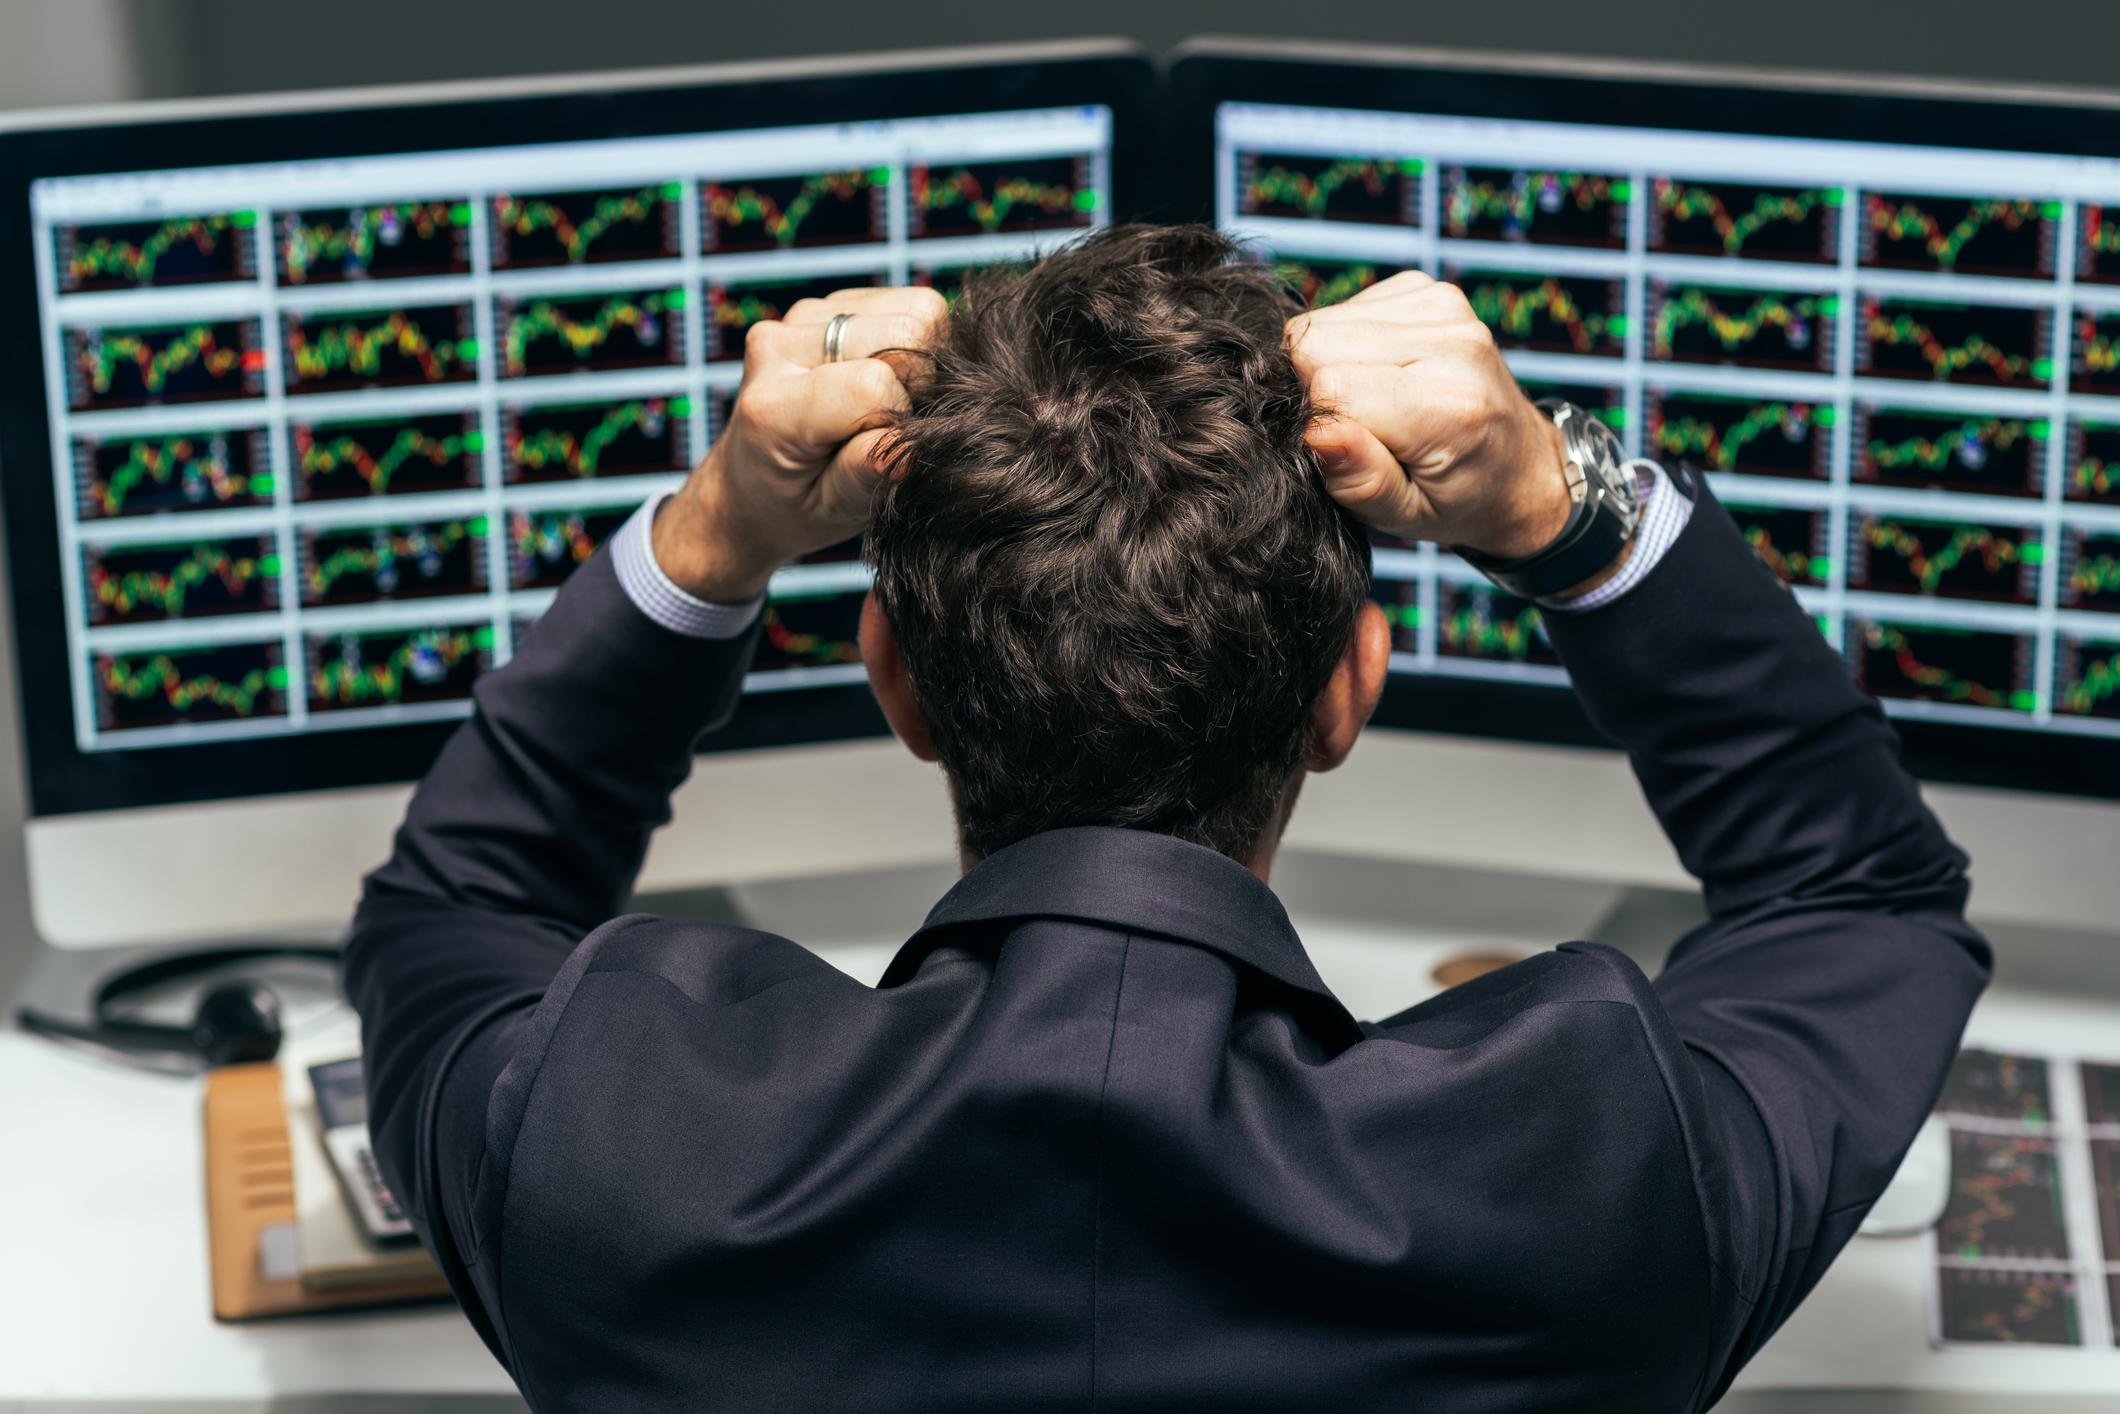 Man looking at stock charts on computer pulling his hair